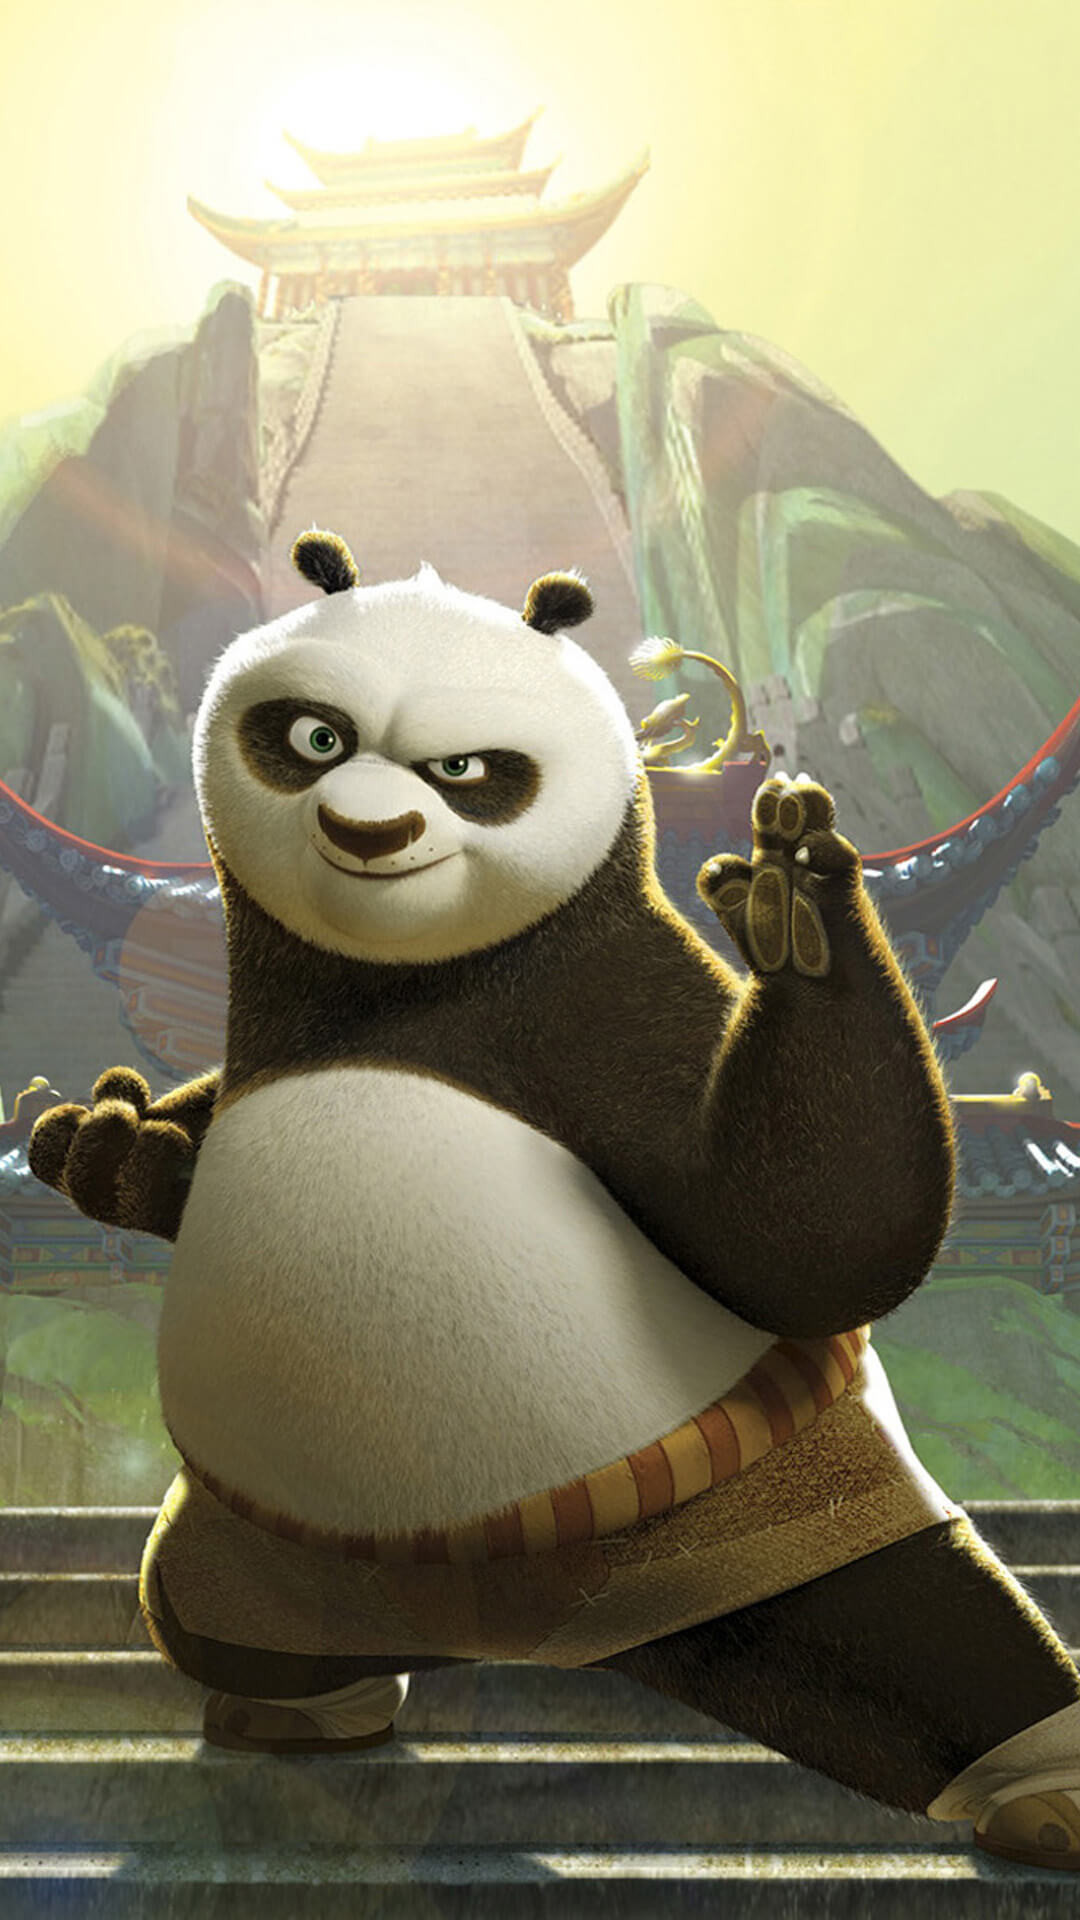 How to download Cartoon Kunfu Panda iPhone wallpaper HD:-